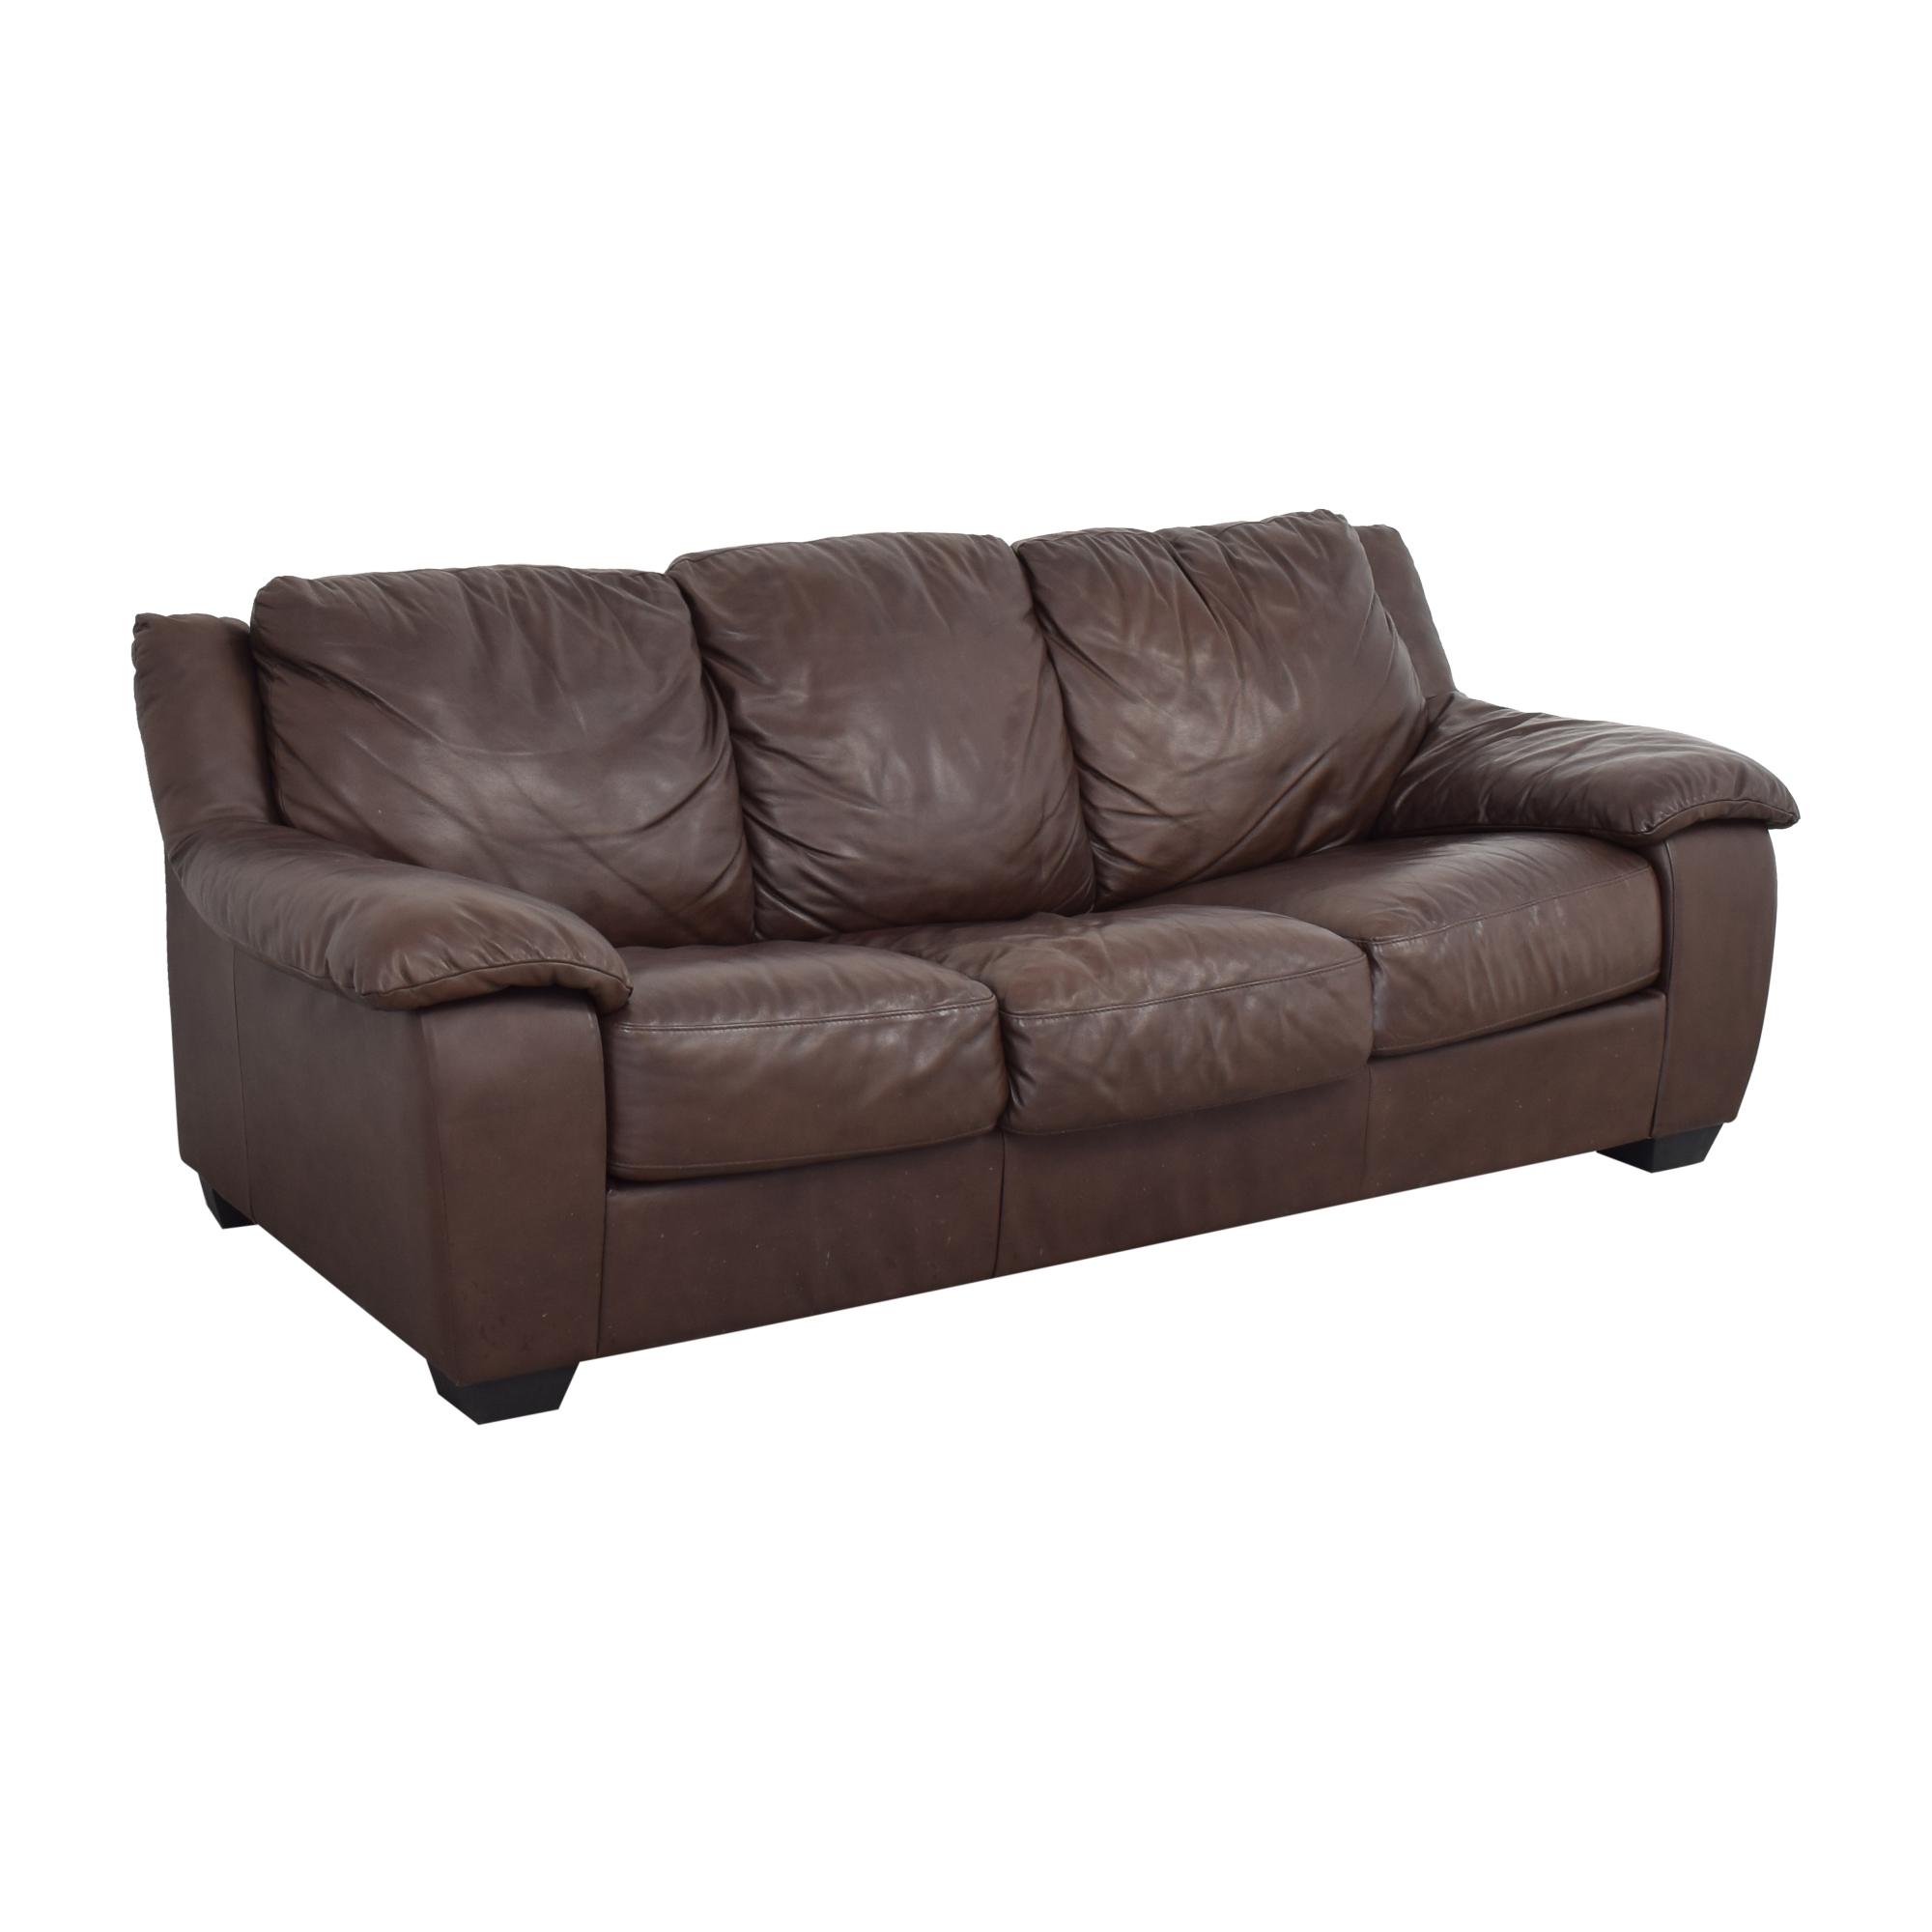 Macy's Macy's Lothan Queen Sleeper Sofa pa